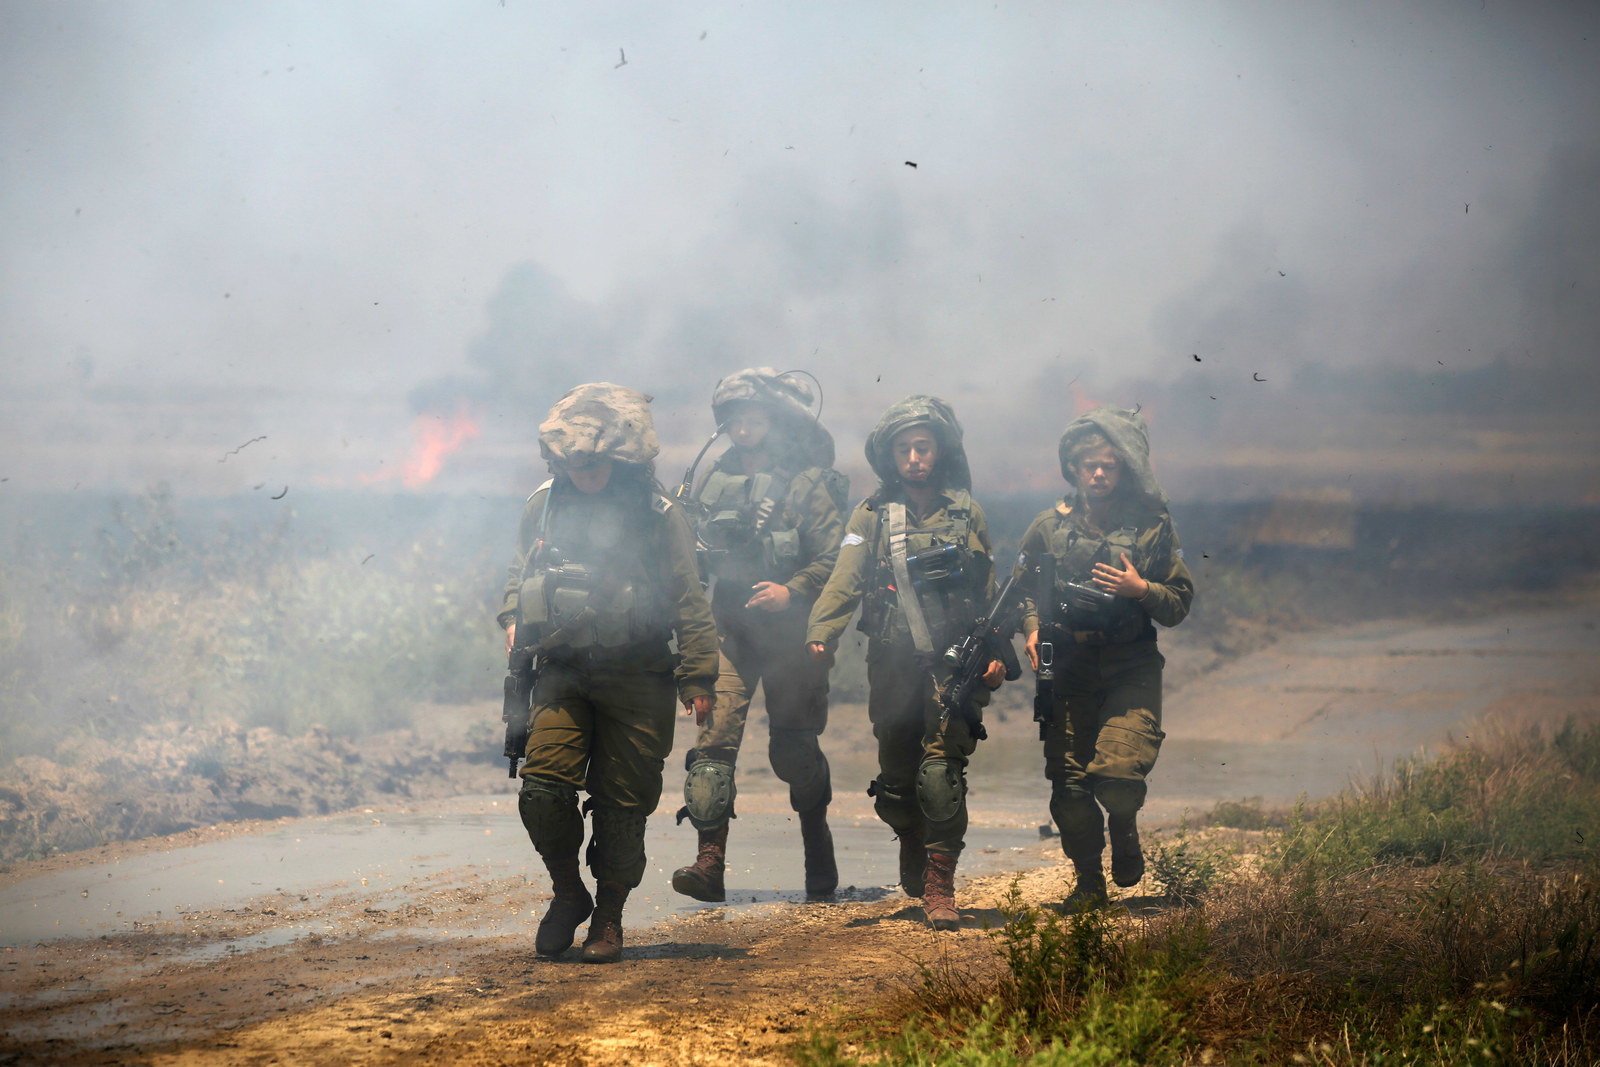 Israeli troops on the Israeli side of the border with Gaza.